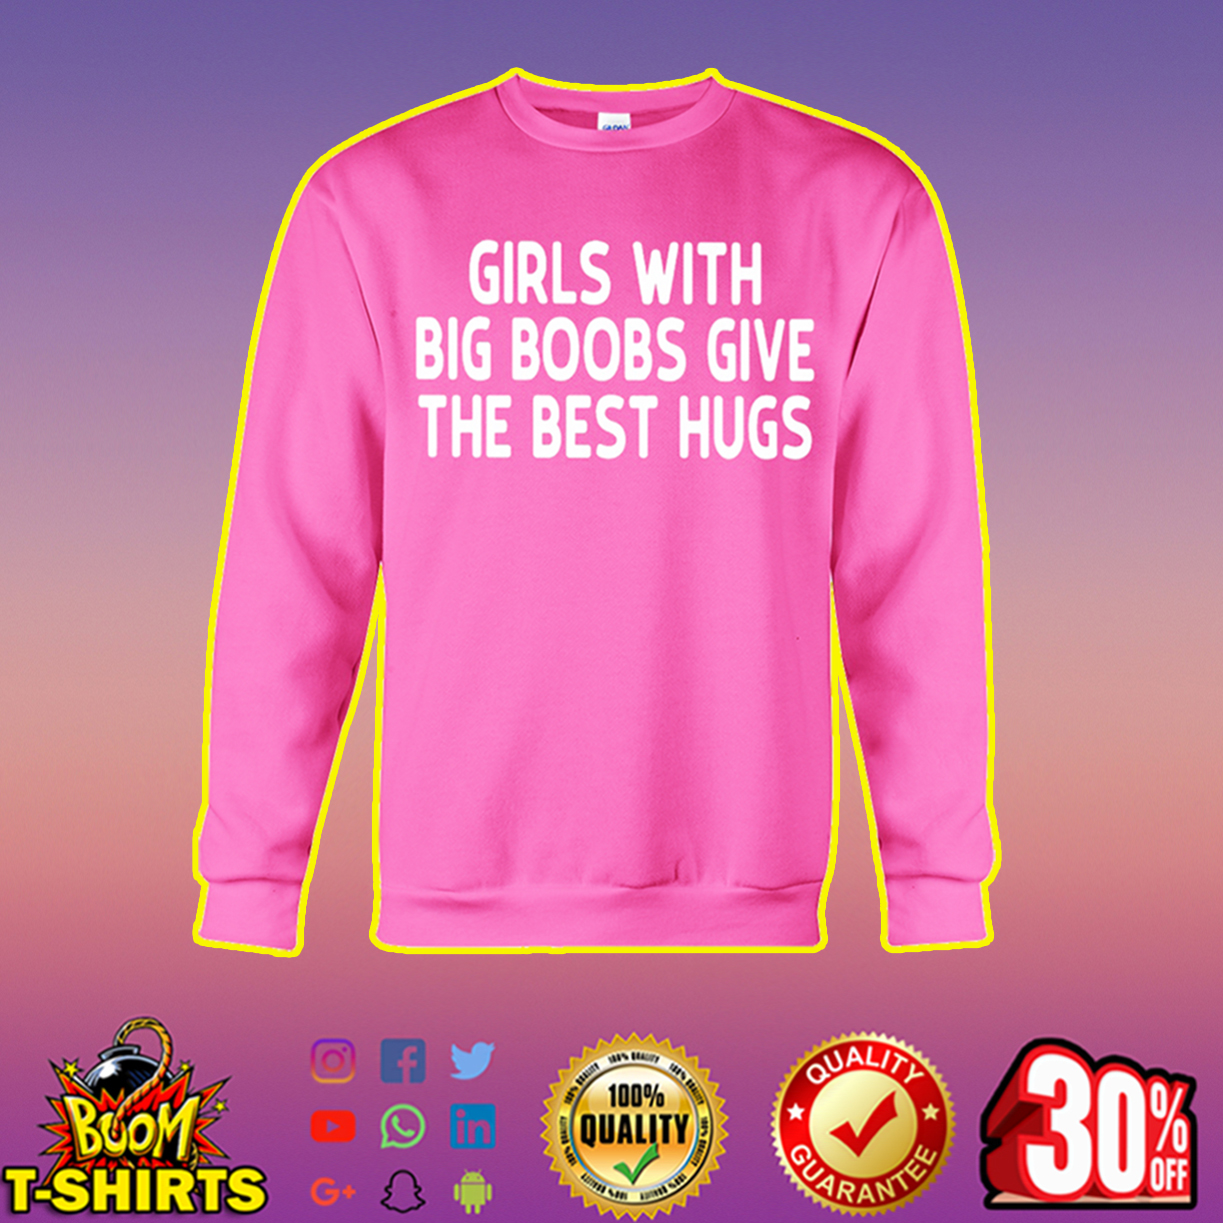 Girls with big boobs give the best hugs sweatshirt